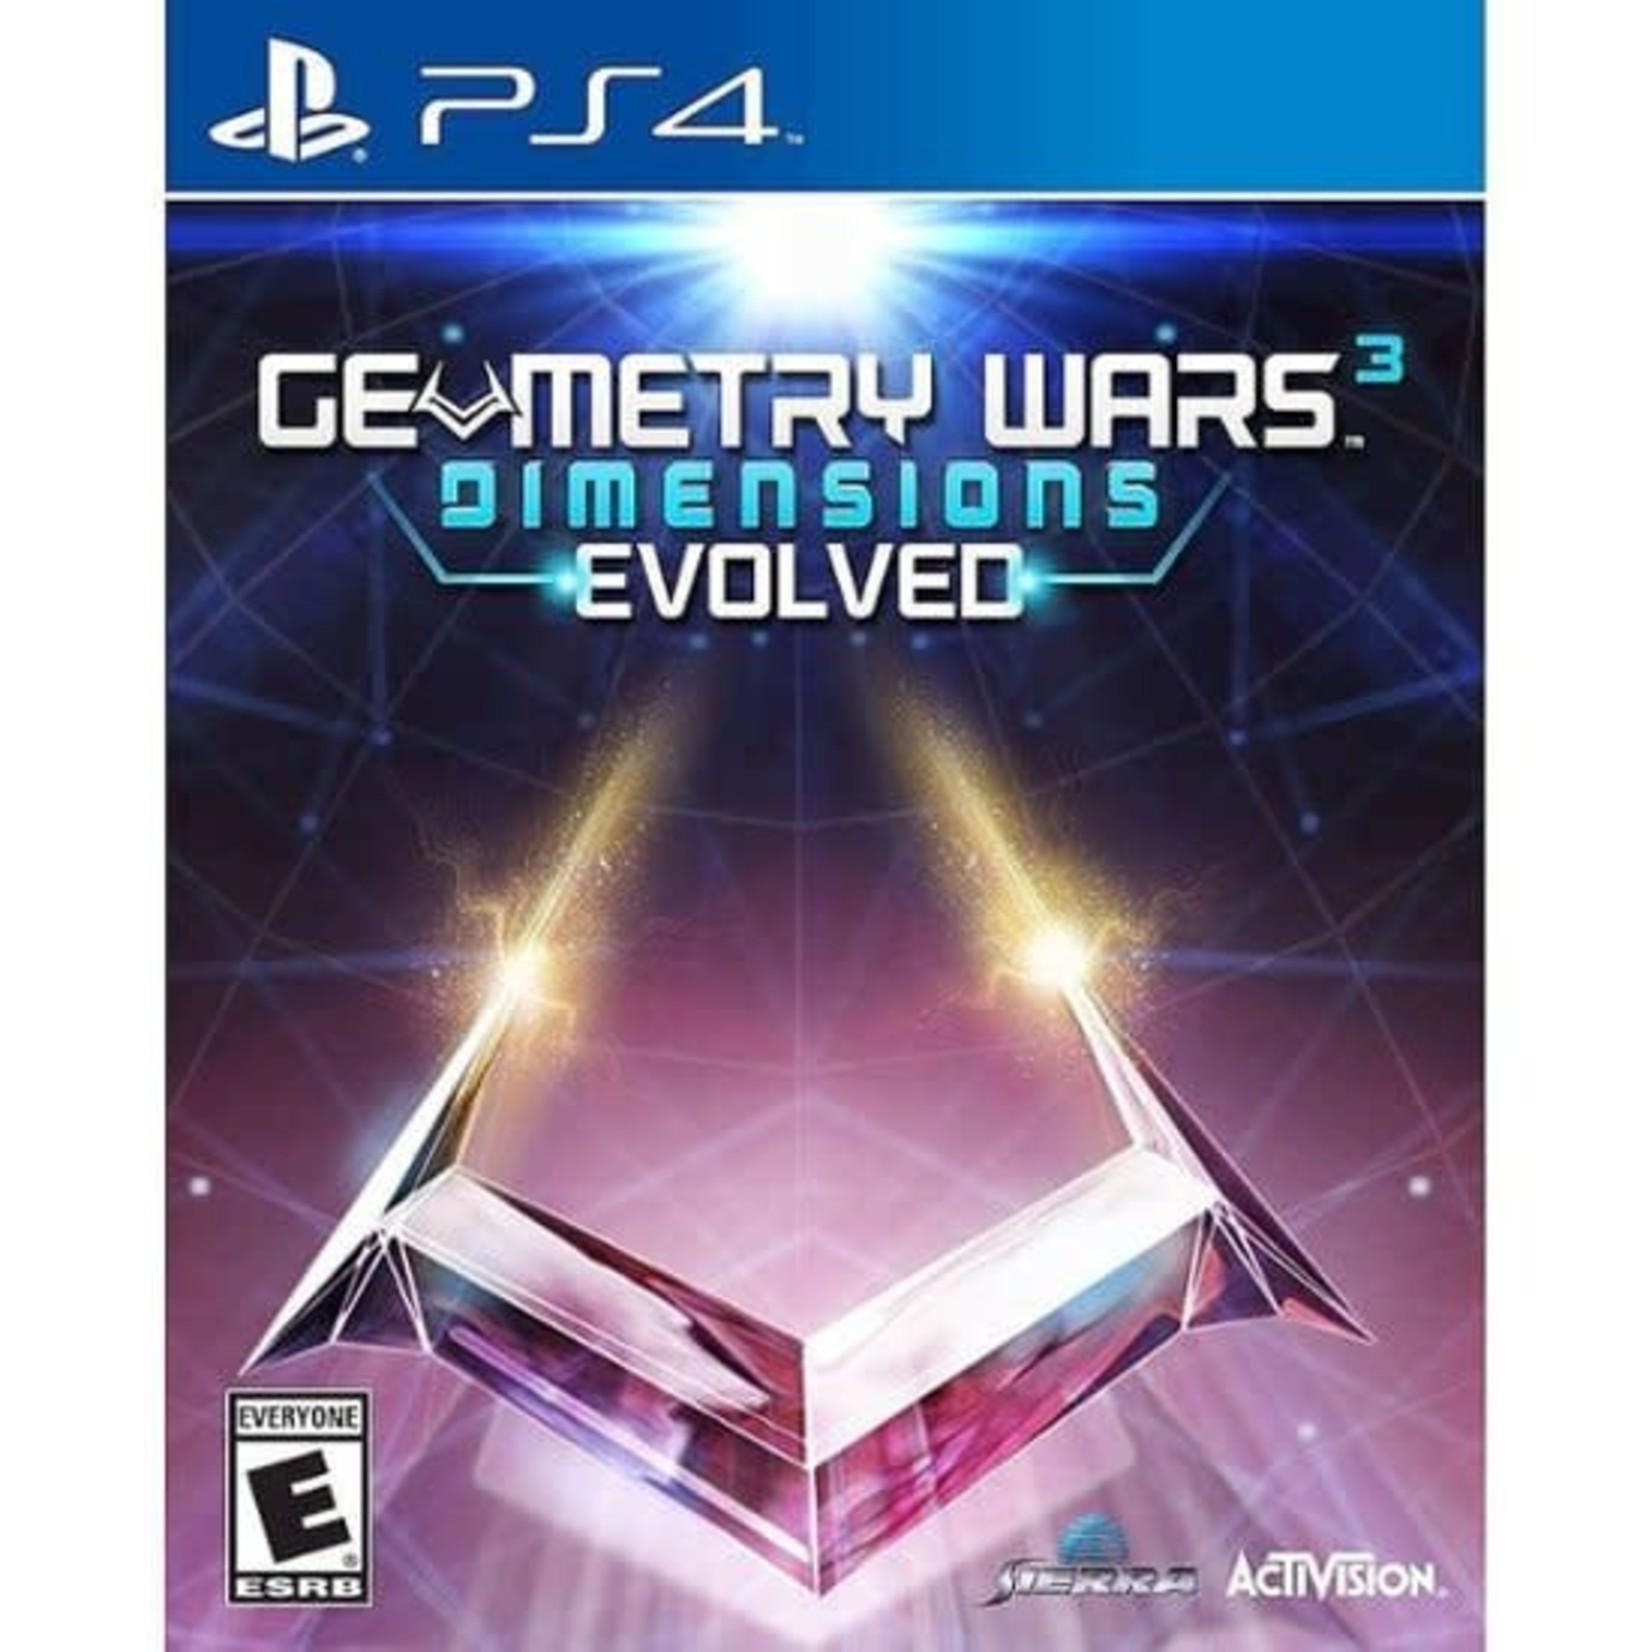 PS4U-Geometry Wars 3 Dimensions Evolved